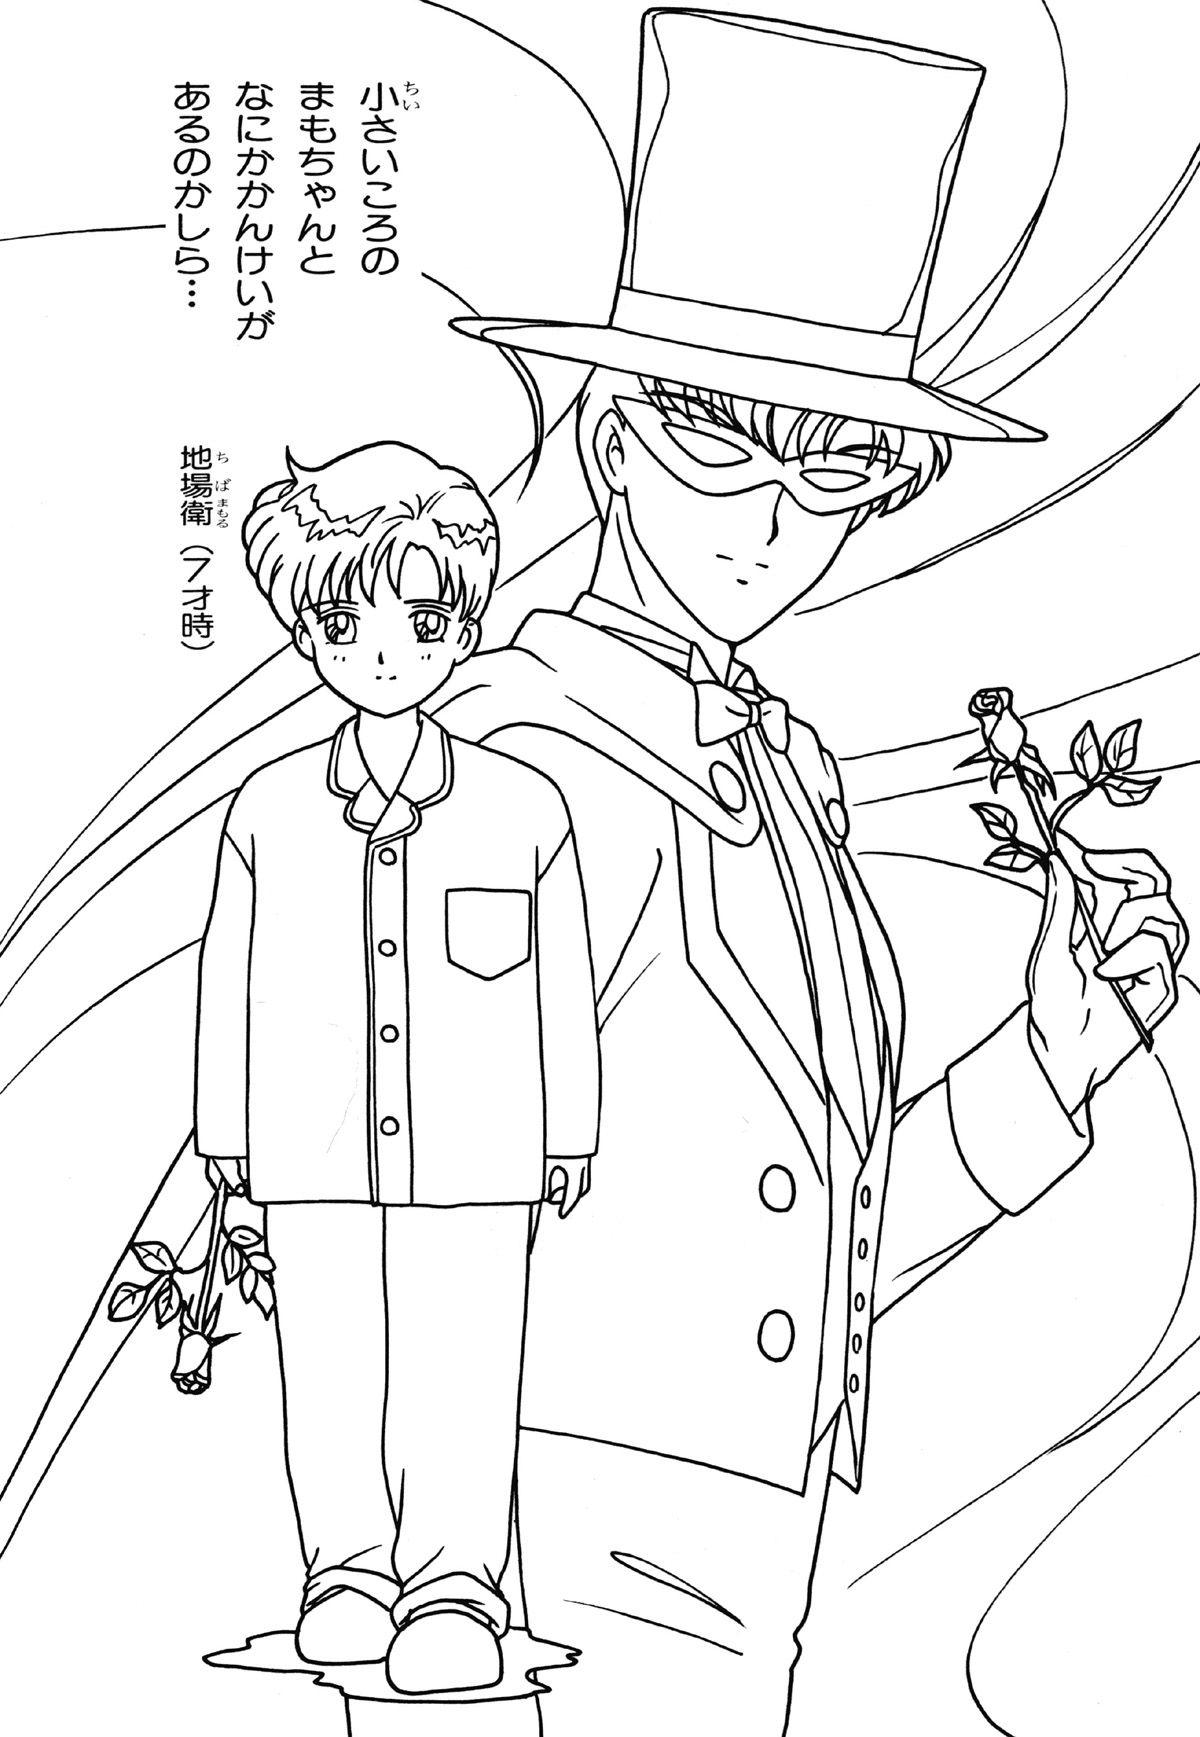 Sailor moon coloring pages, Sailor moon, Sailor moon crystal